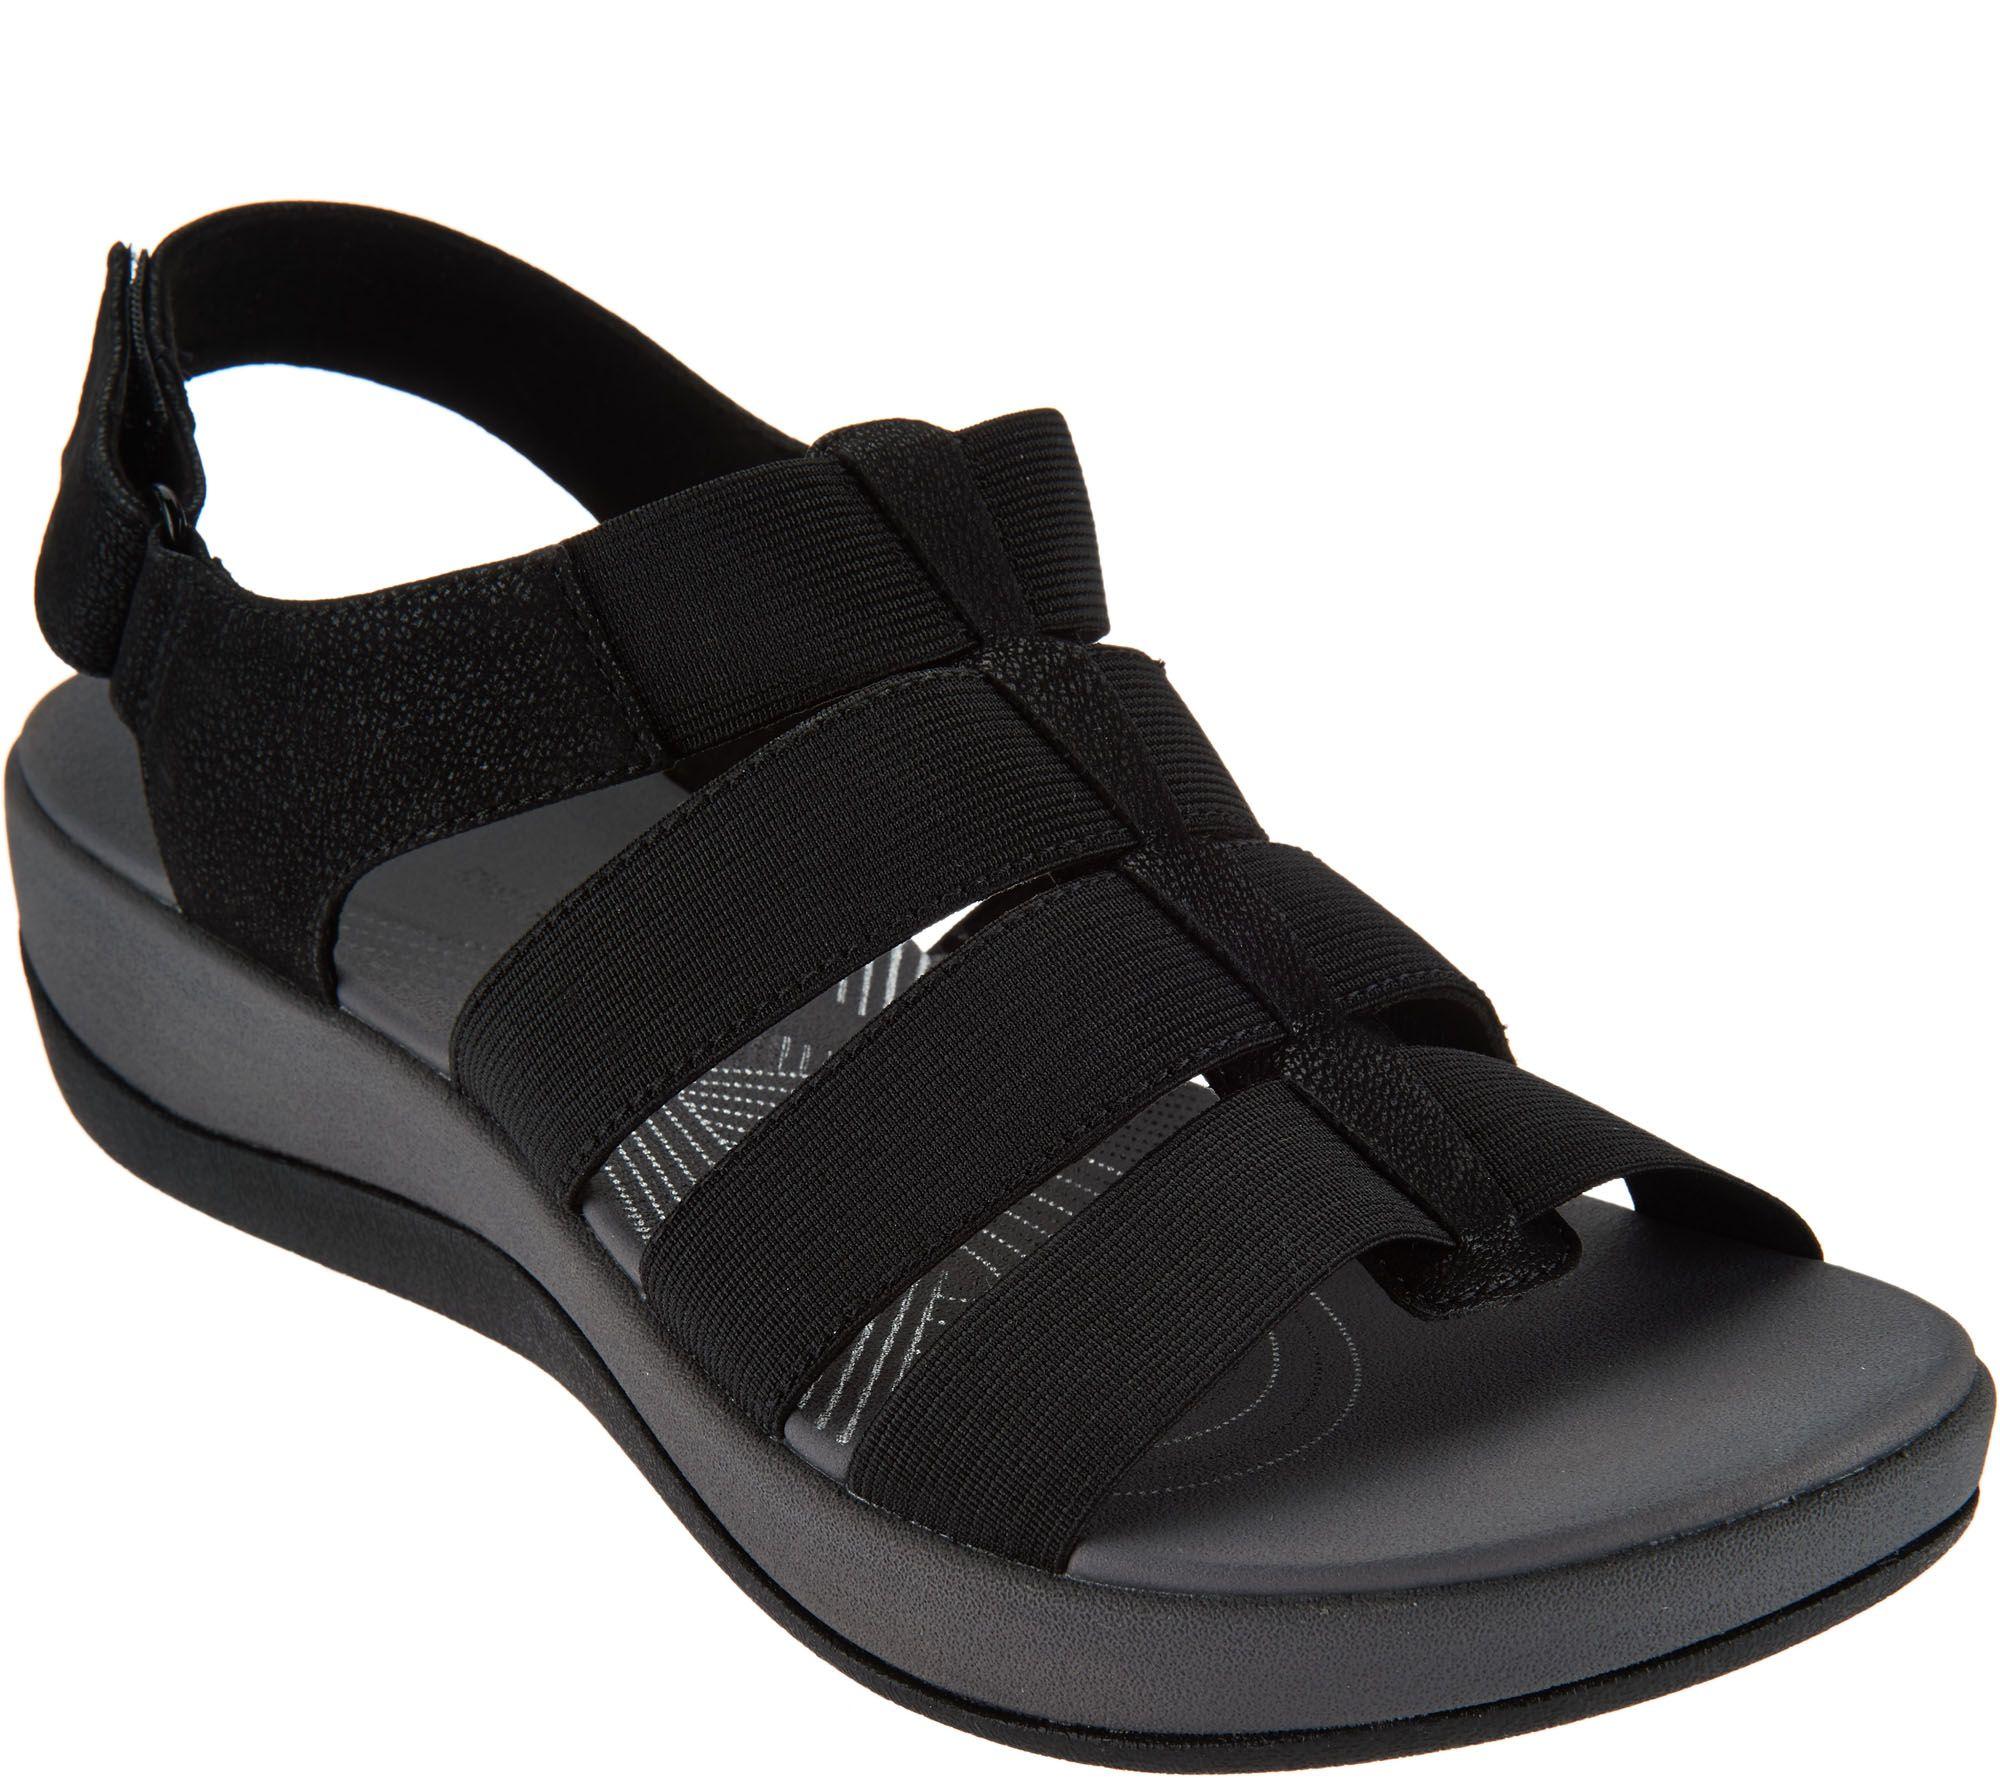 Black earth sandals - Black Earth Sandals 24